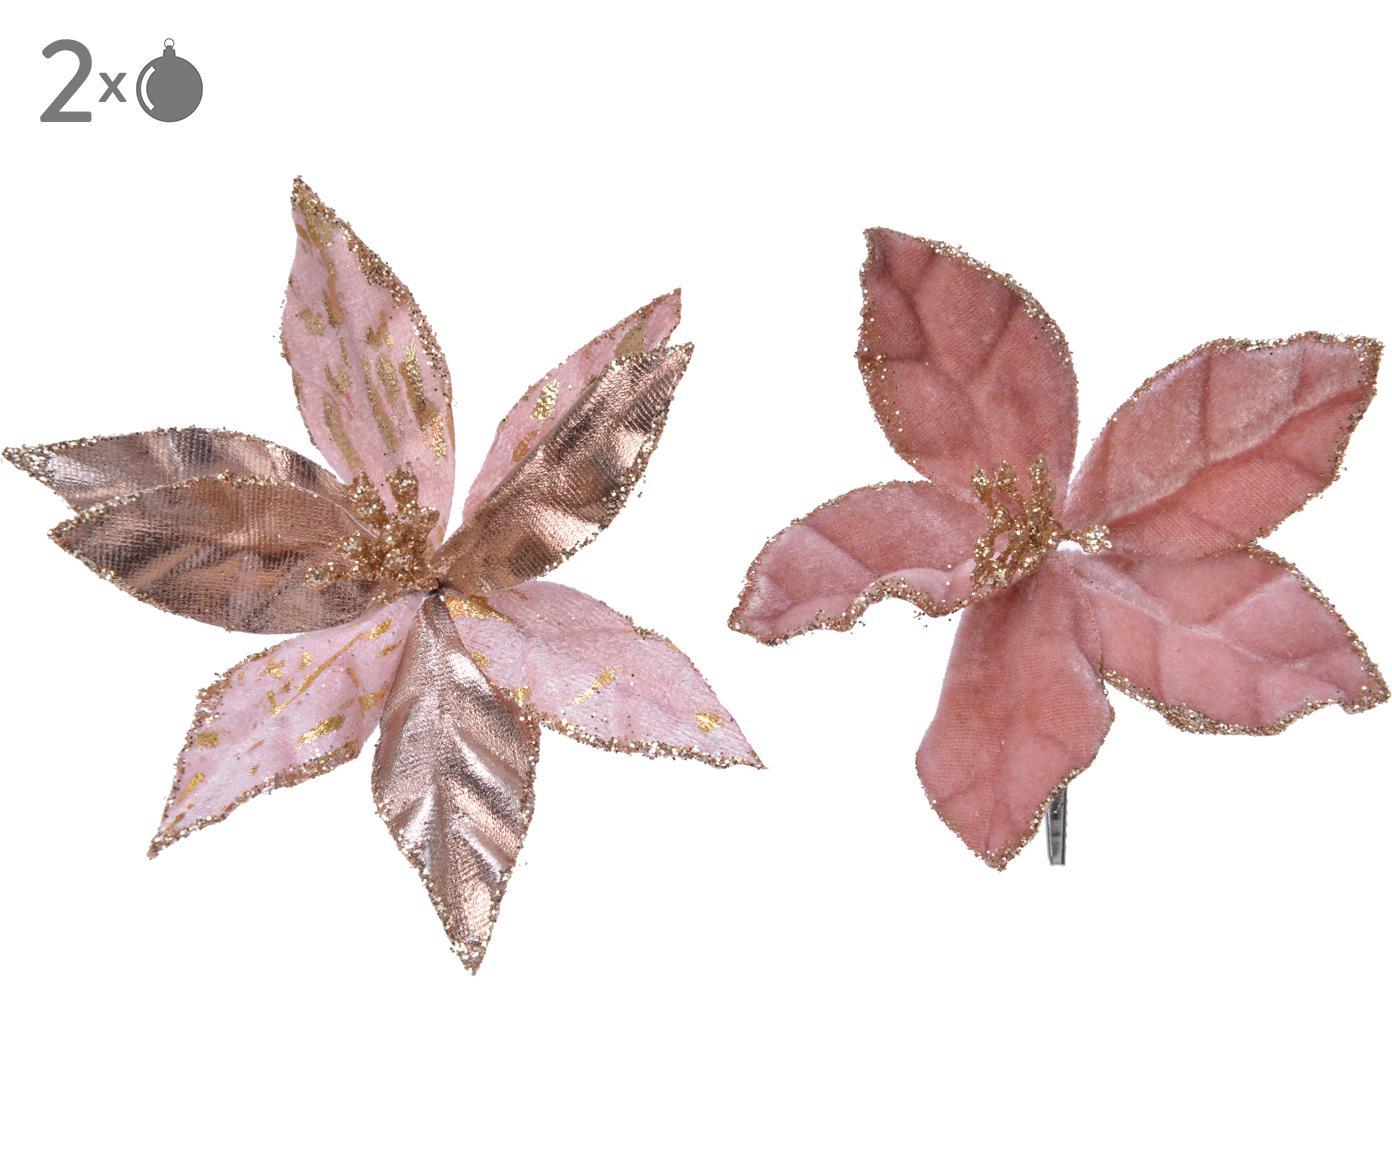 Baumanhänger-Set Blossom, 2-tlg., Kunststoff (PES), Rosatöne, Goldfarben, Ø 11 x H 2 cm